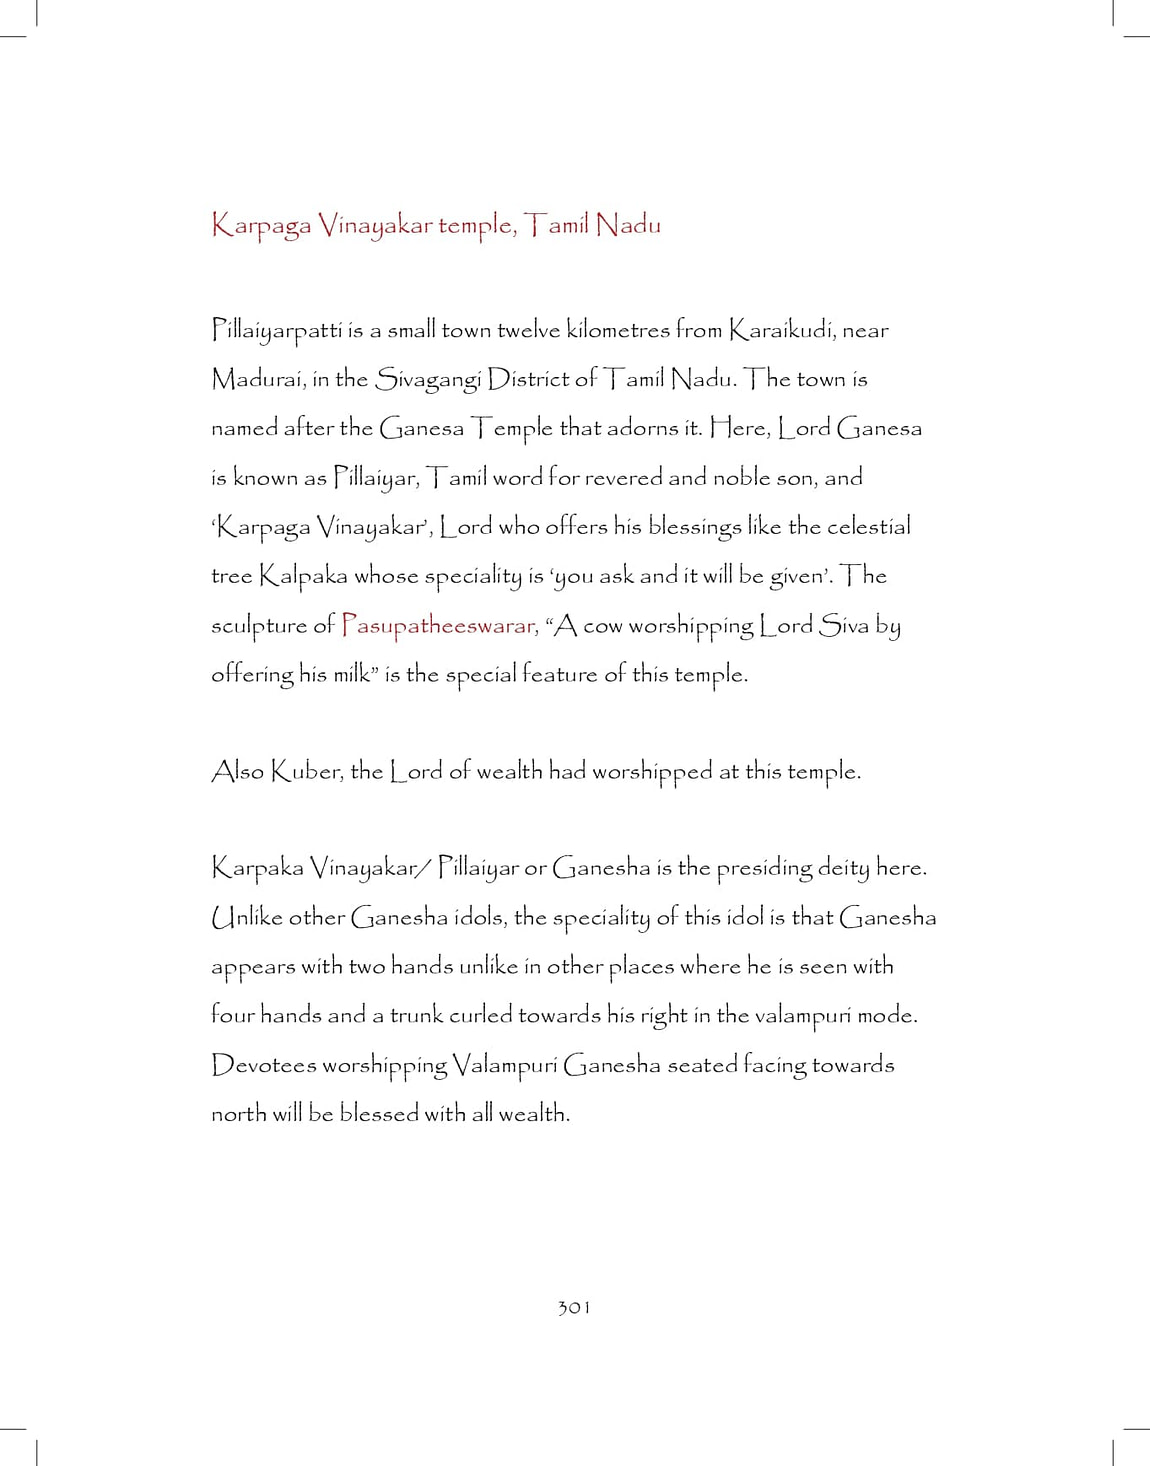 Ganesh-print_pages-to-jpg-0301.jpg